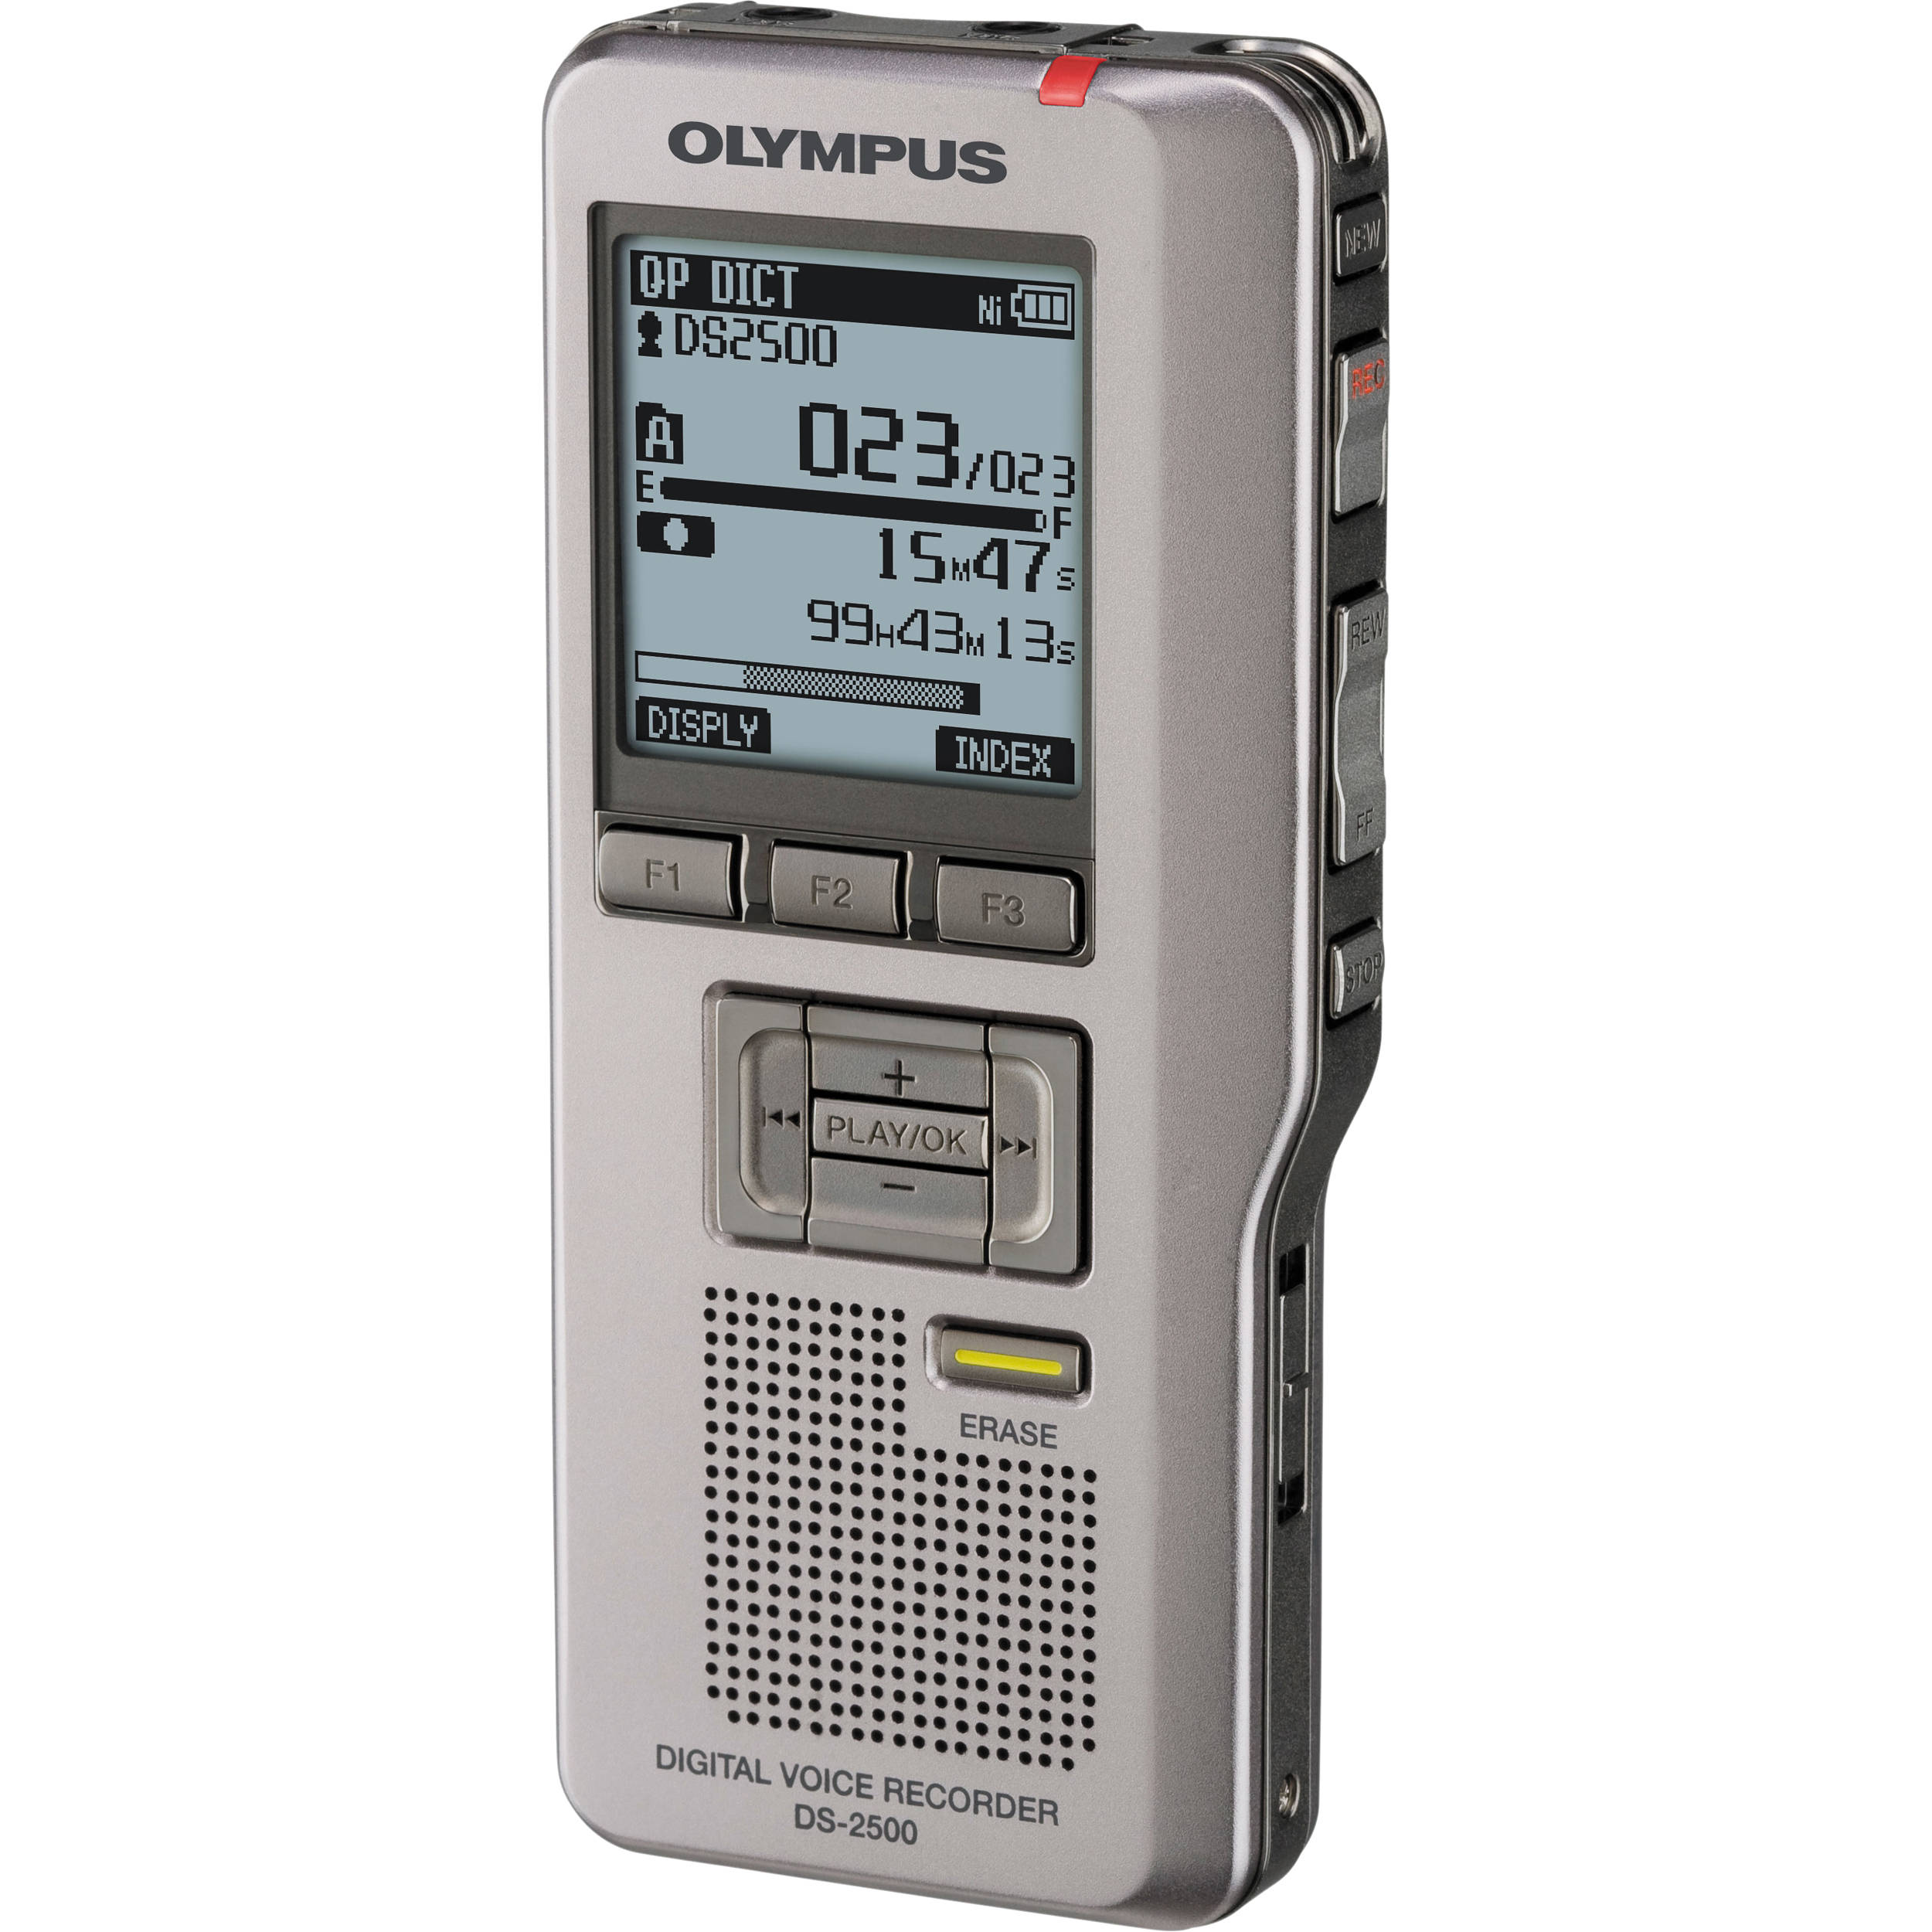 Handheld Voice Recorders Bh Photo Video Sony Tx800 Digital Recorder Tx Series Olympus Ds 2500